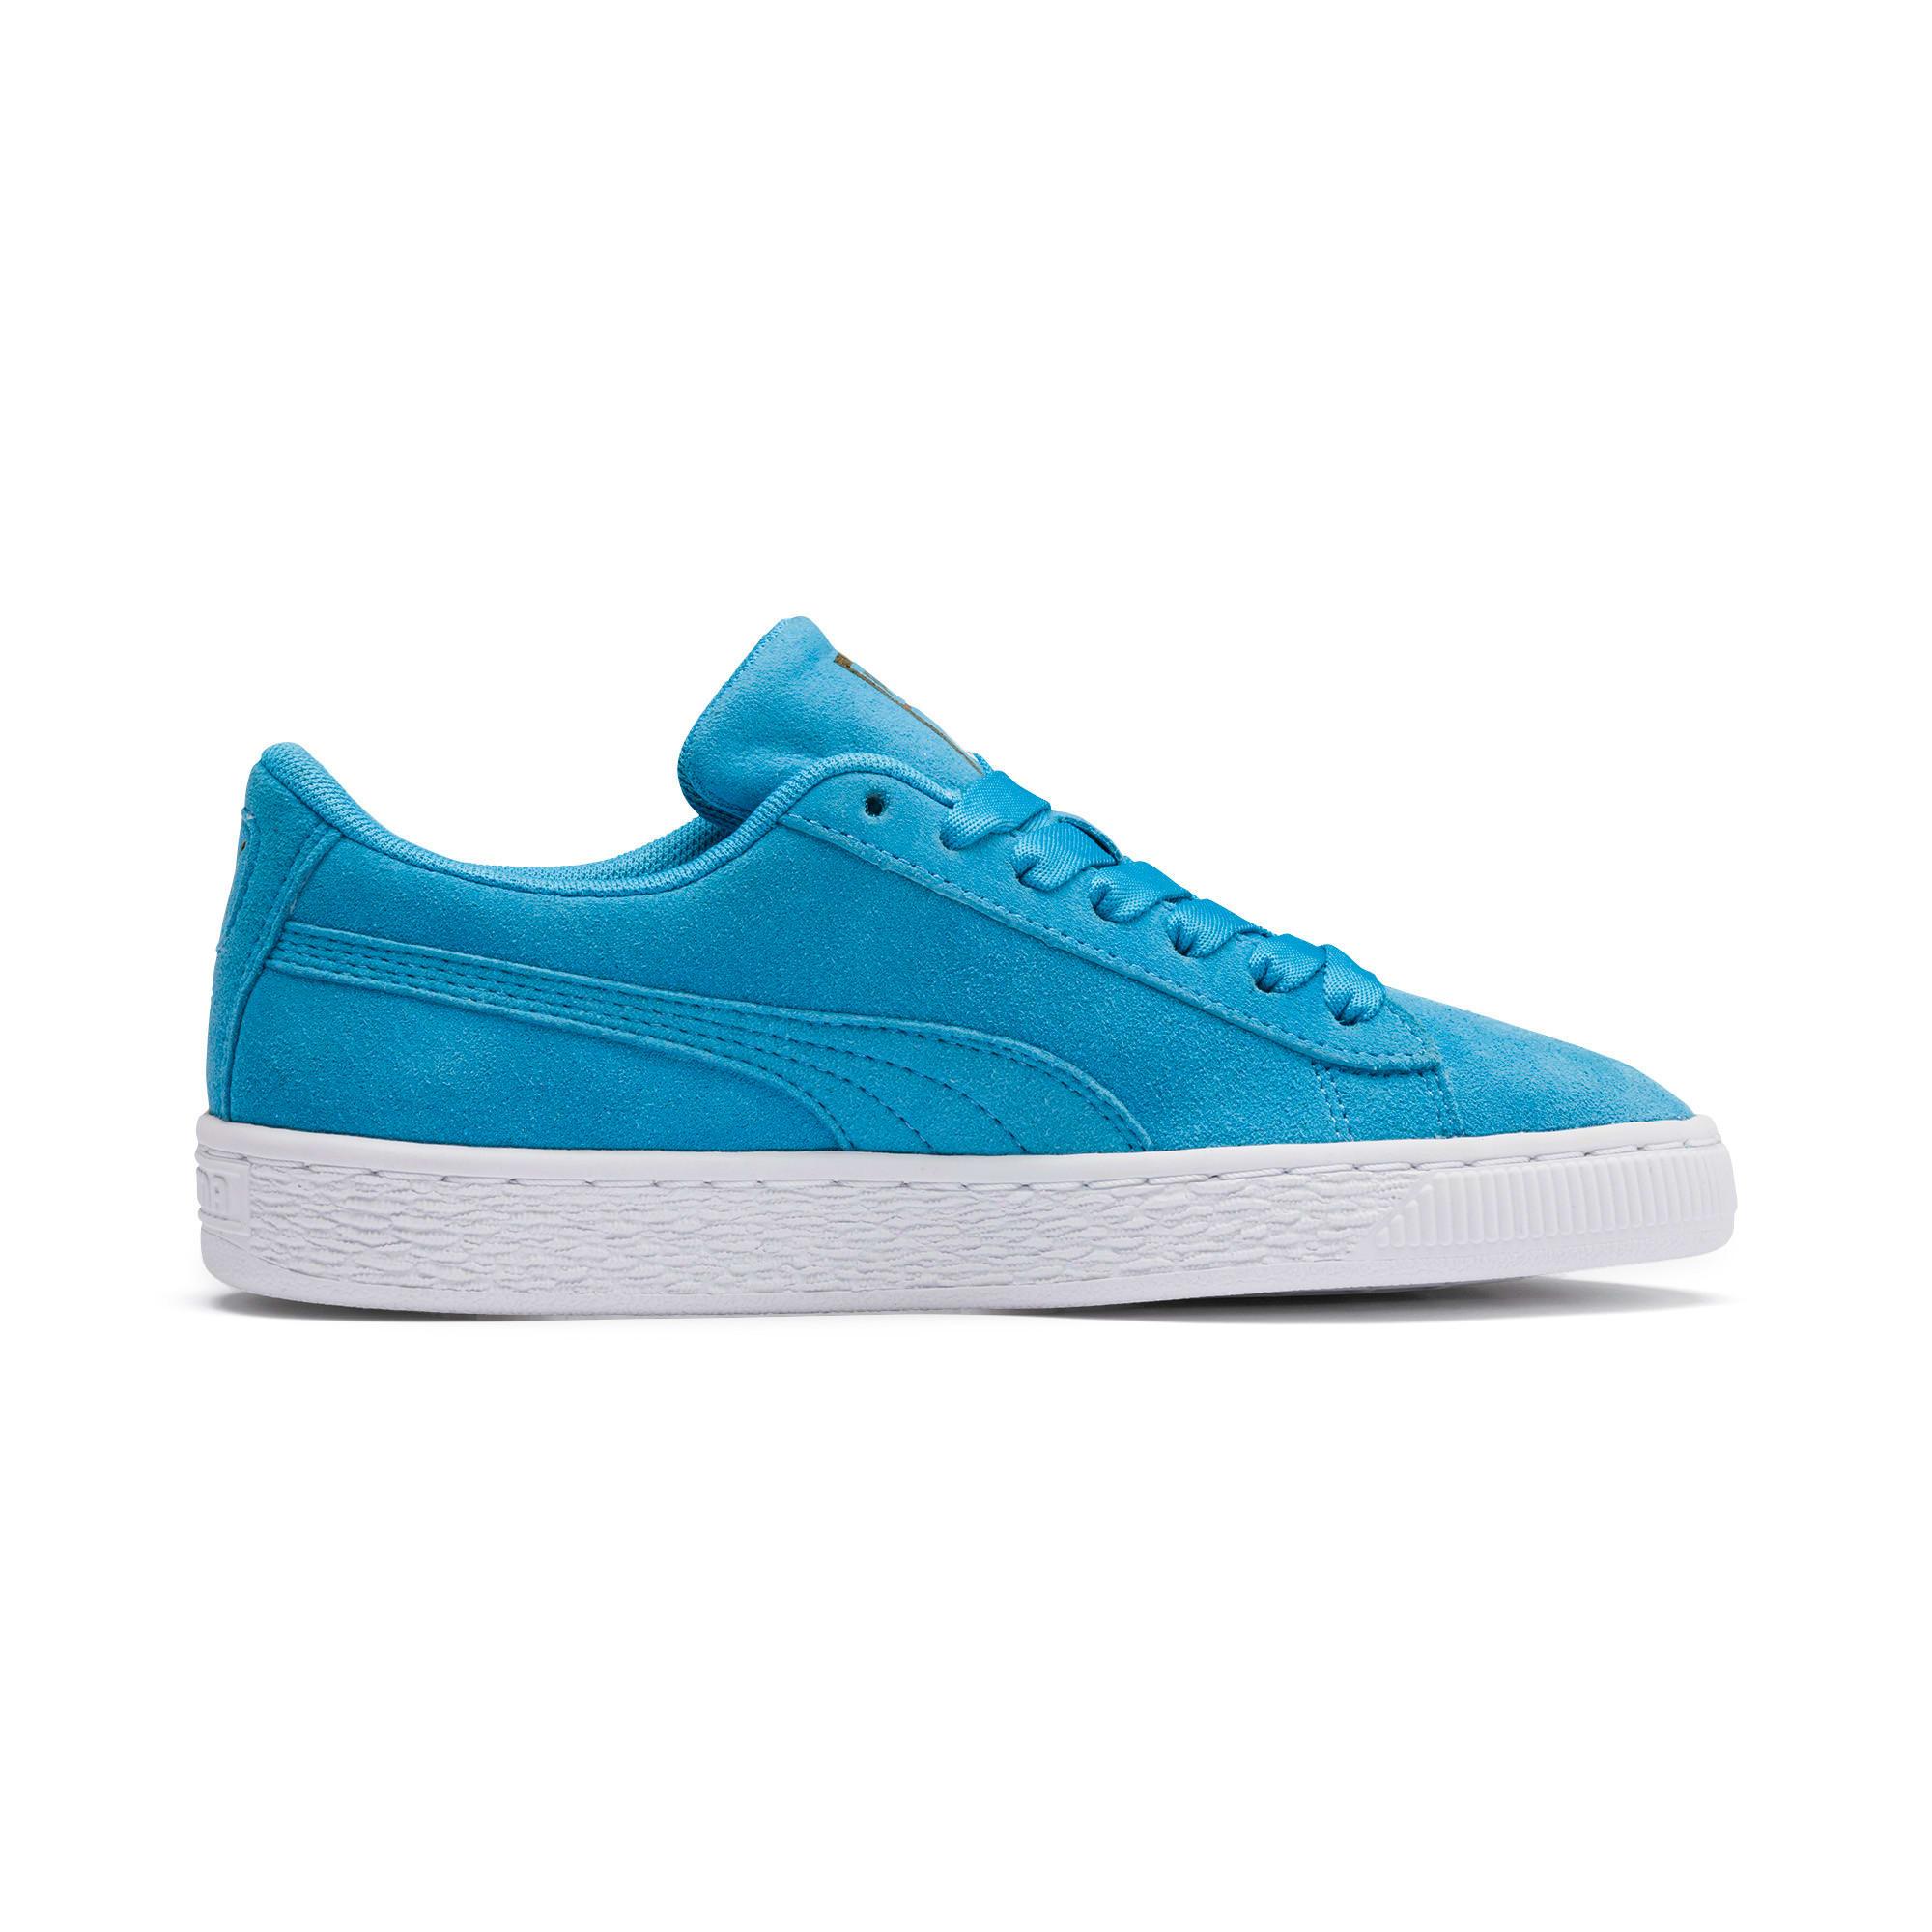 Thumbnail 5 of PUMA x SESAME STREET 50 Suede Statement Sneakers JR, Bleu Azur-Puma White, medium